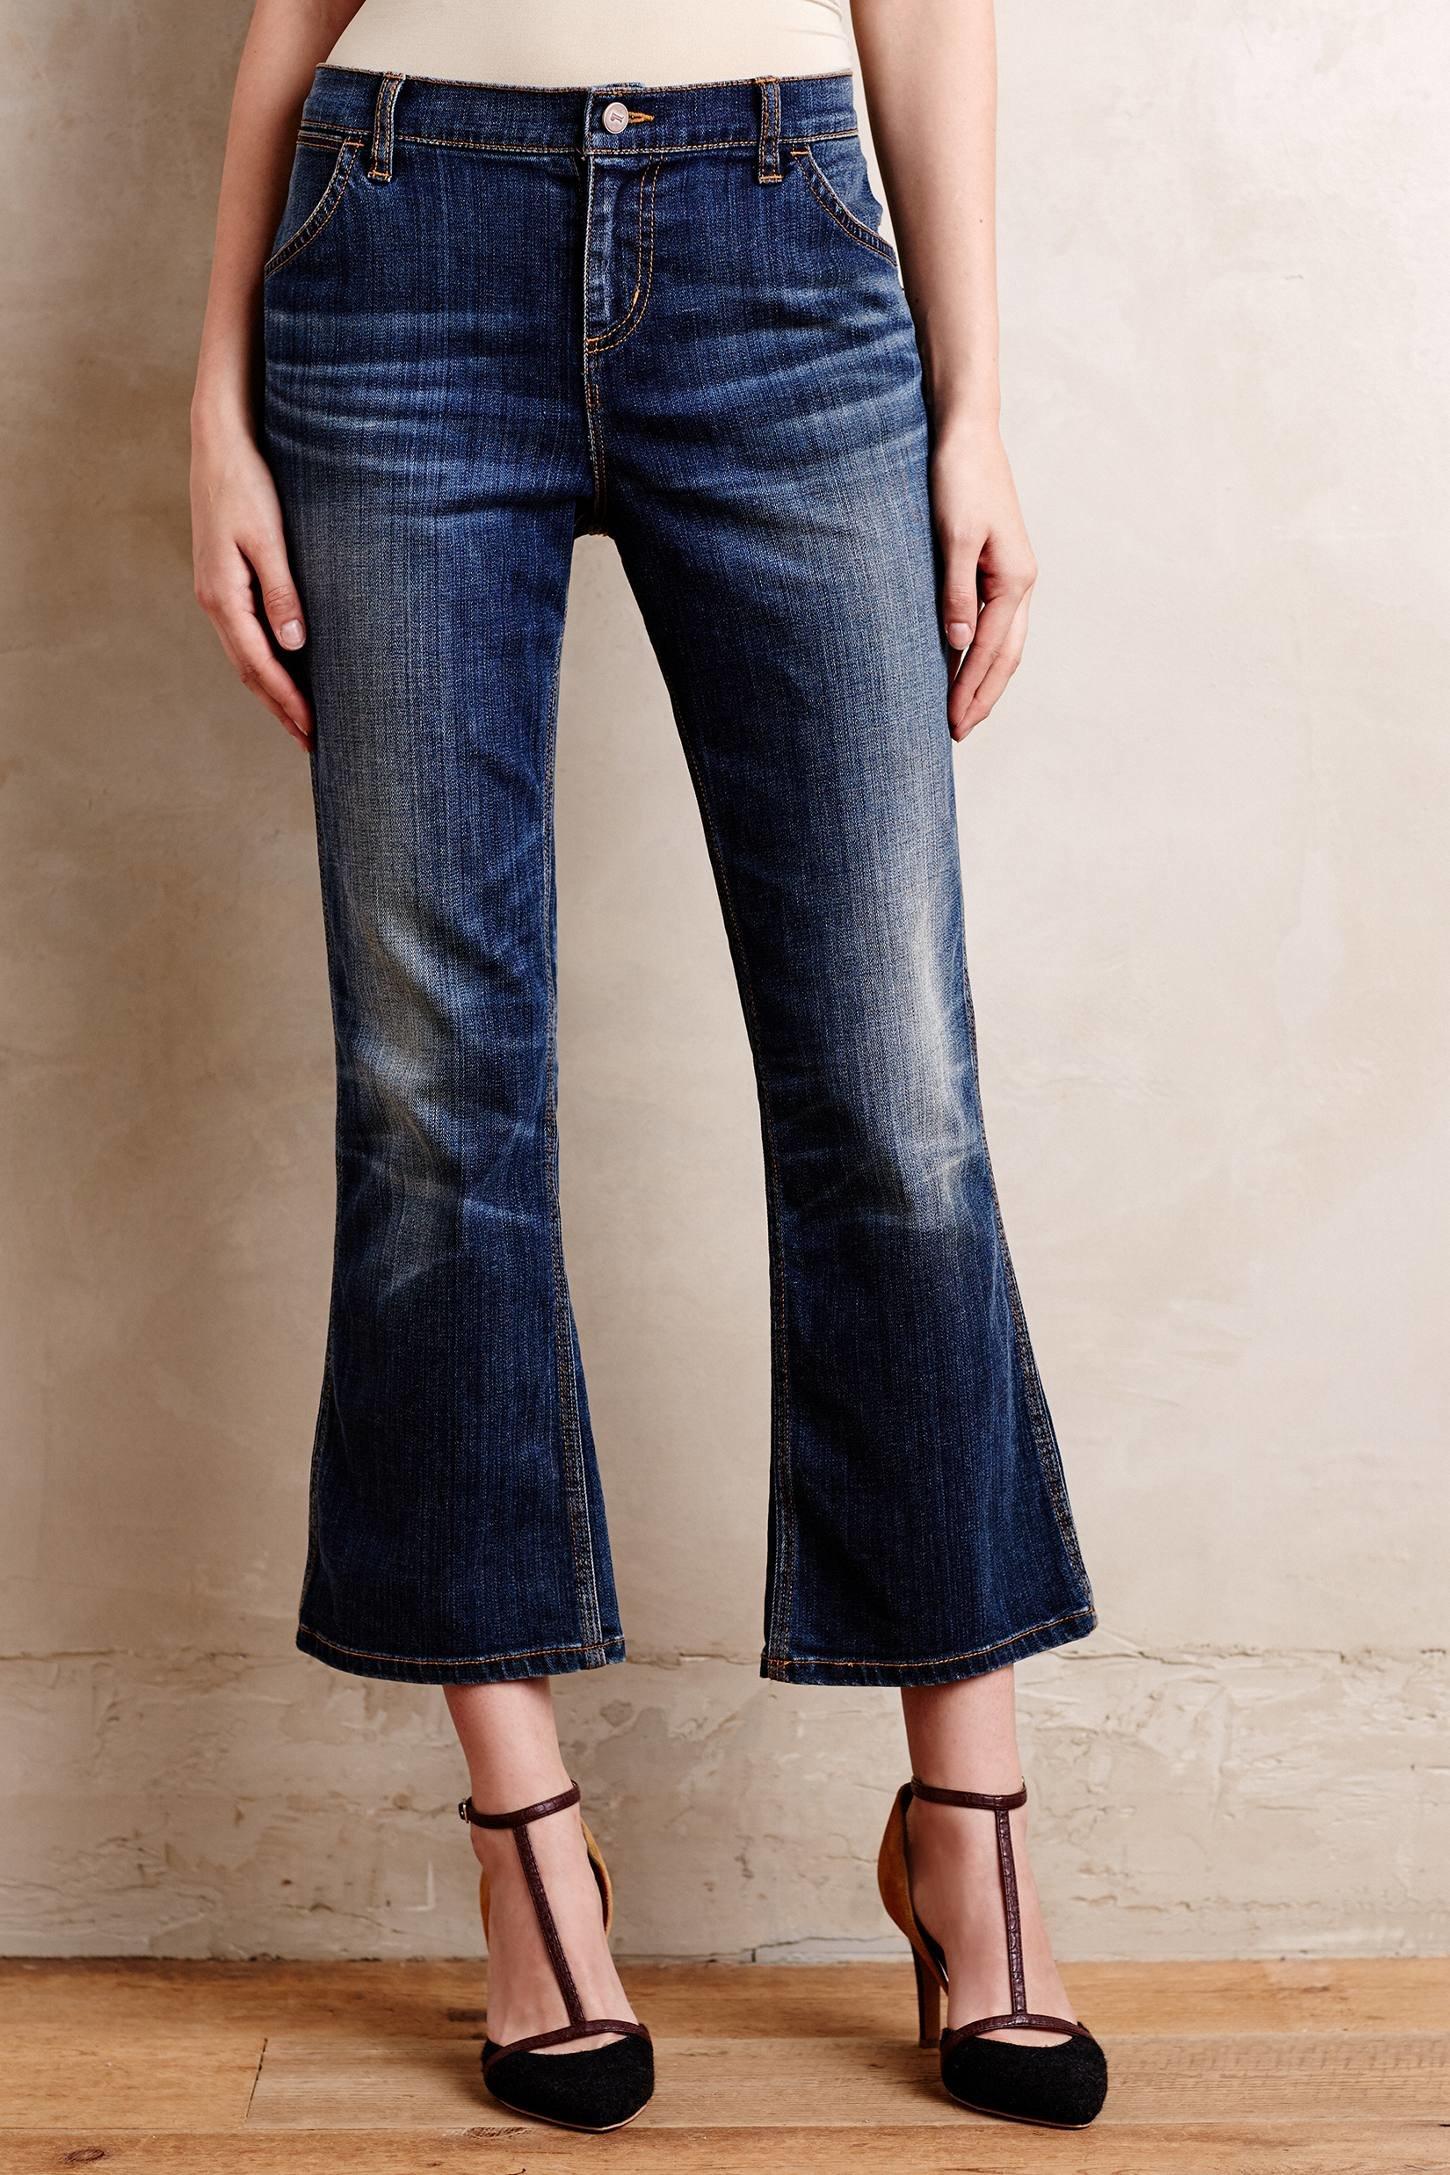 lyst pilcro stet cropped flare jeans in blue. Black Bedroom Furniture Sets. Home Design Ideas